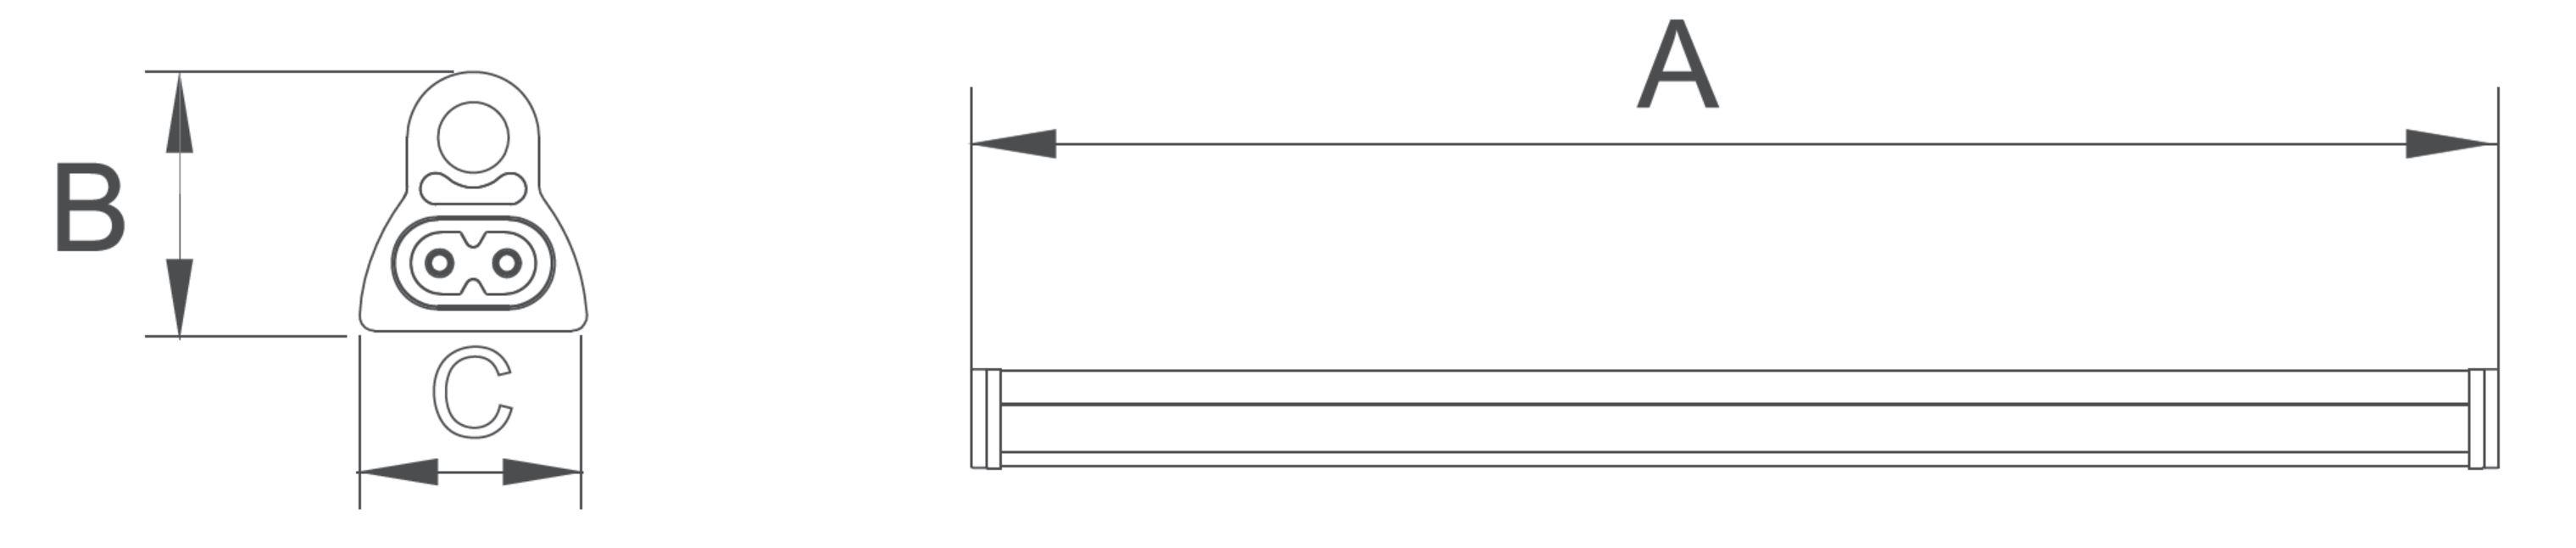 LED Röhre T5 integrierter Driver Abmessungen